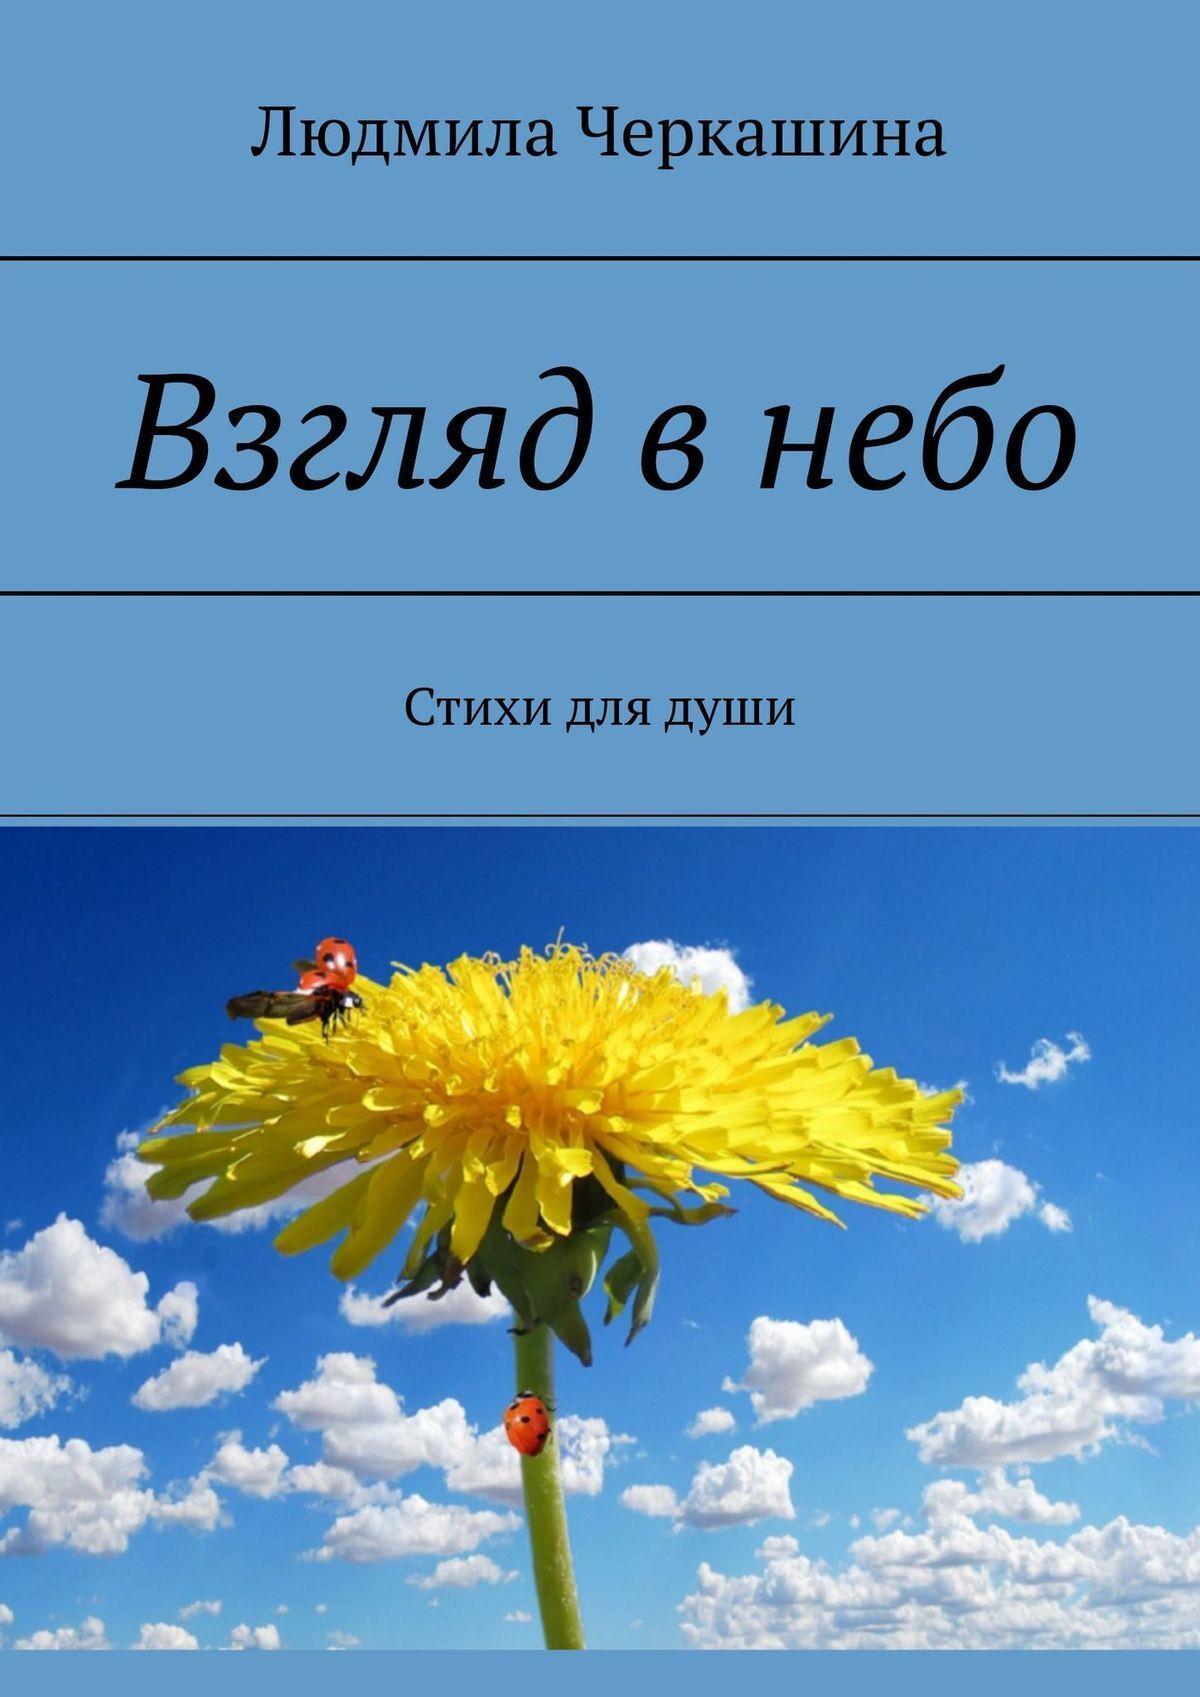 Взгляд в небо. Стихи длядуши_Людмила Черкашина